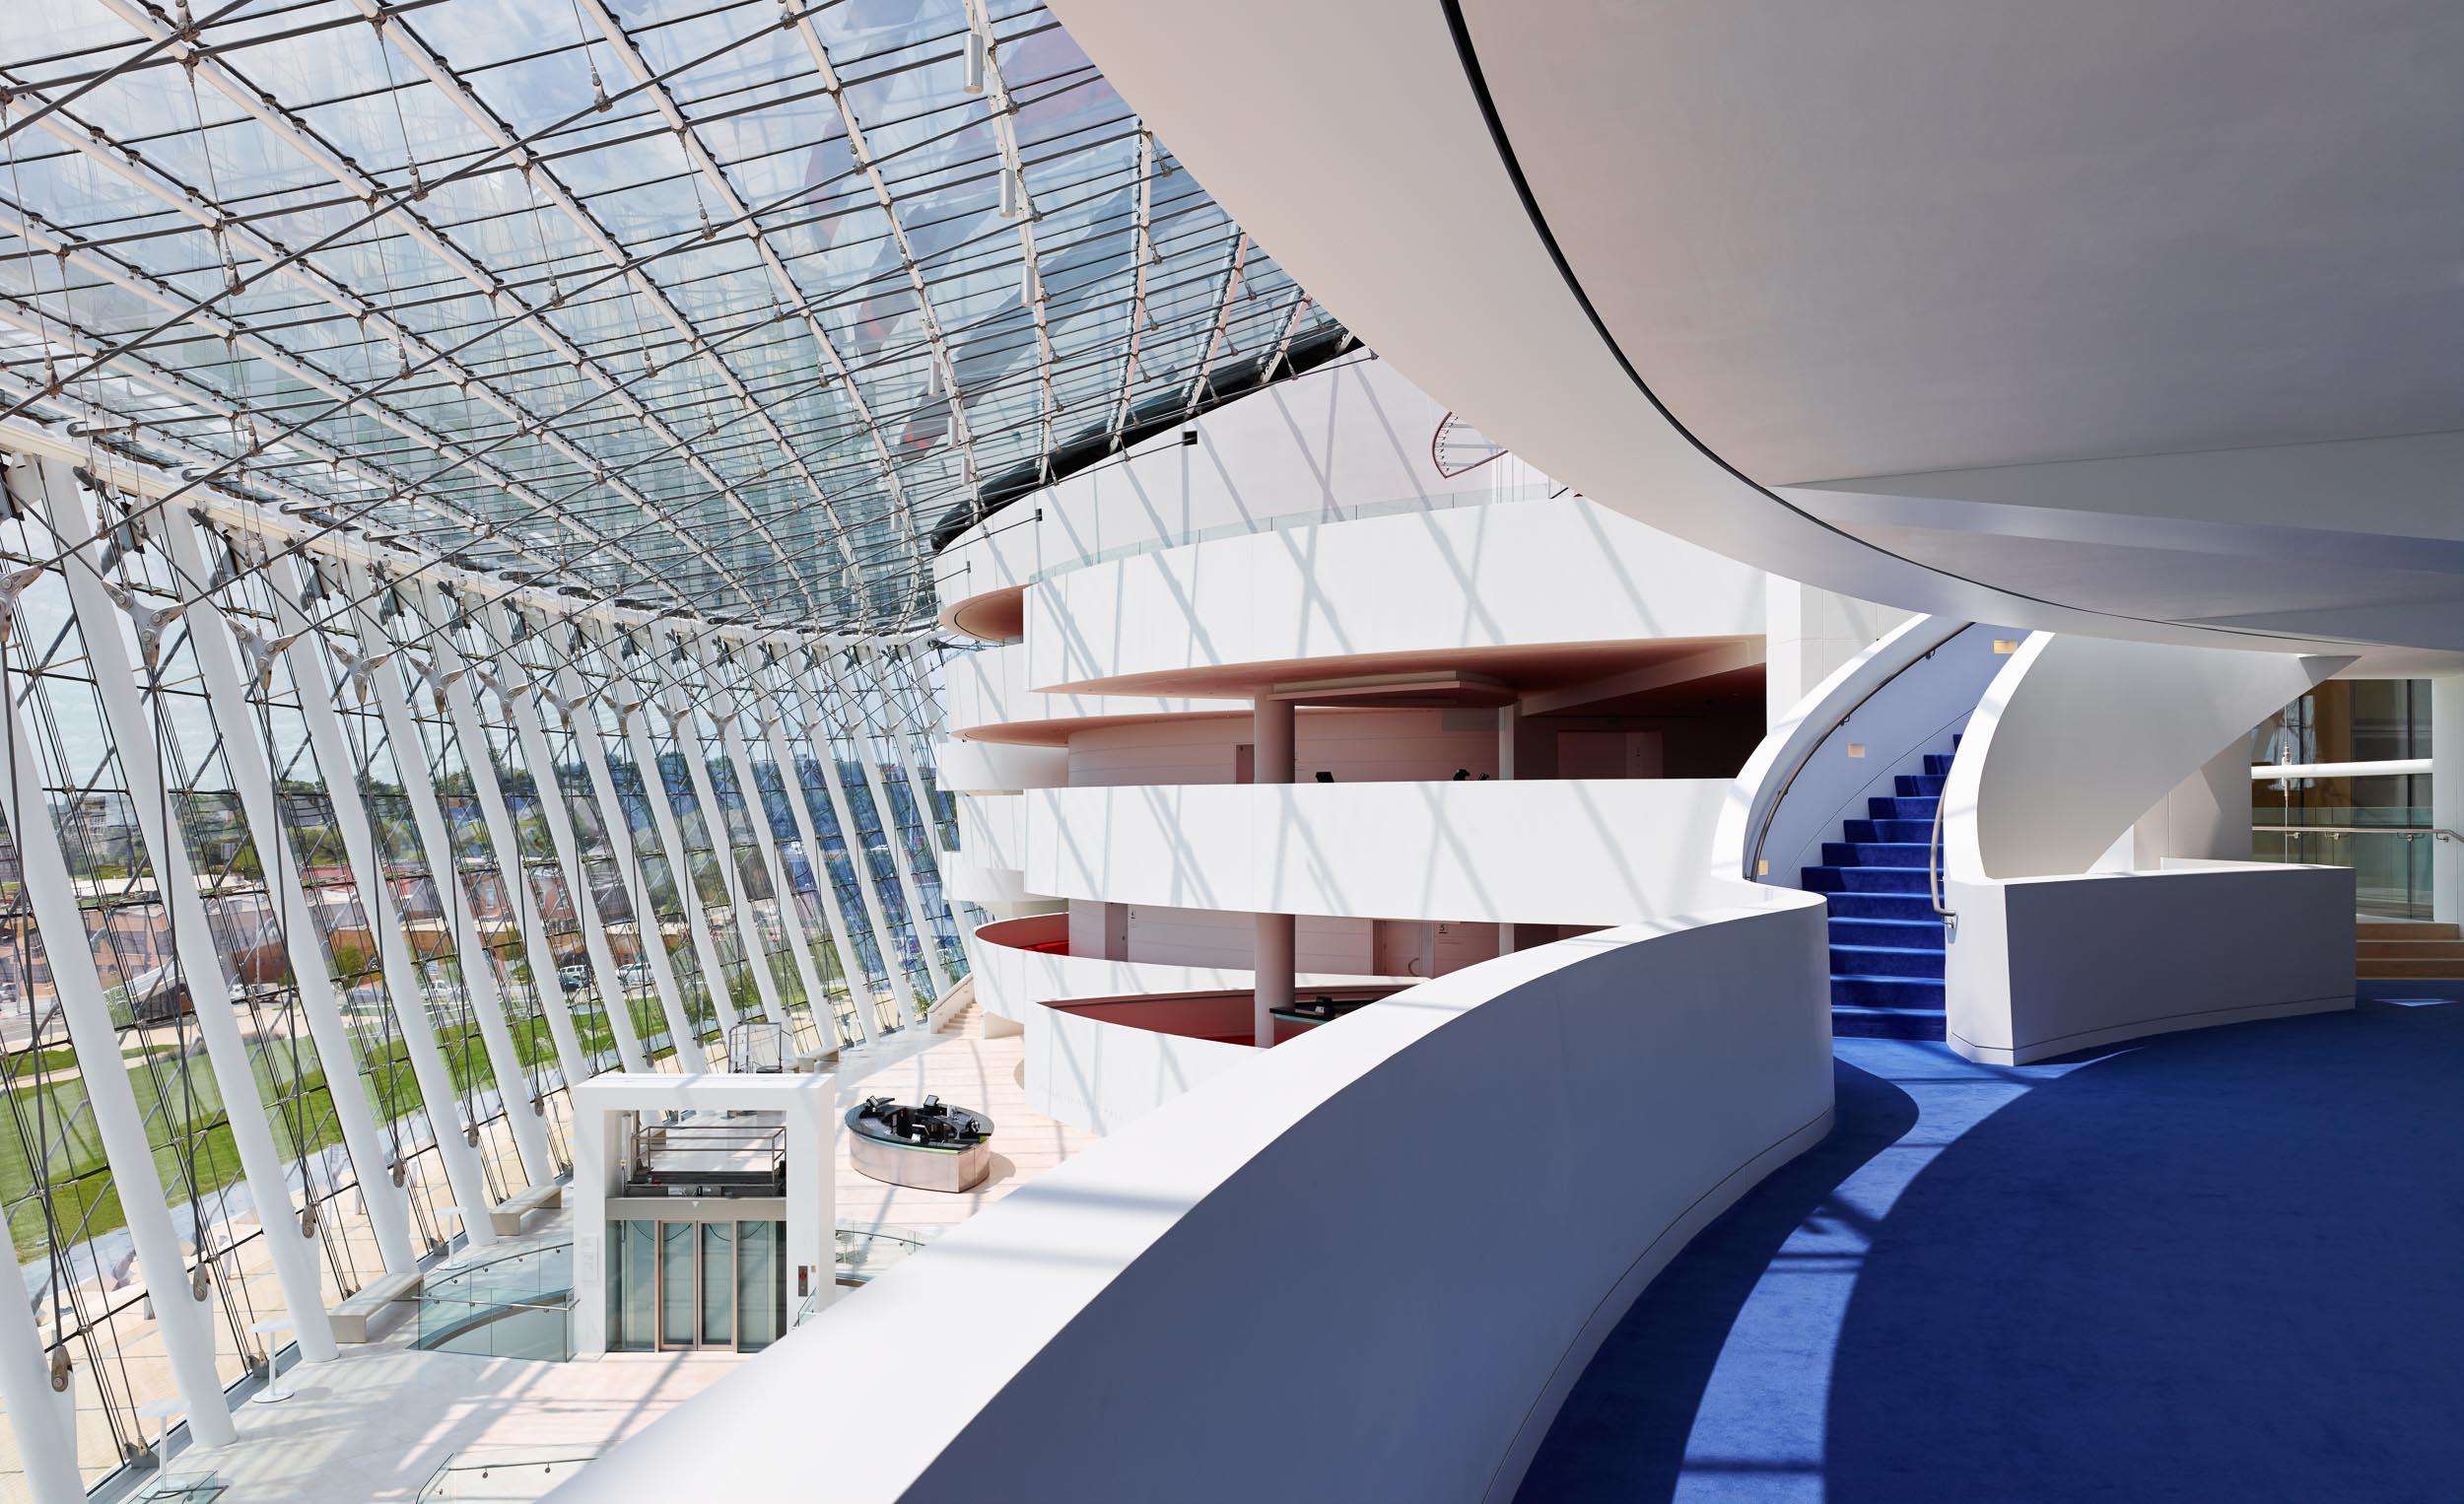 Interior of the Kauffman Performing Arts Center in Kansas City, MO